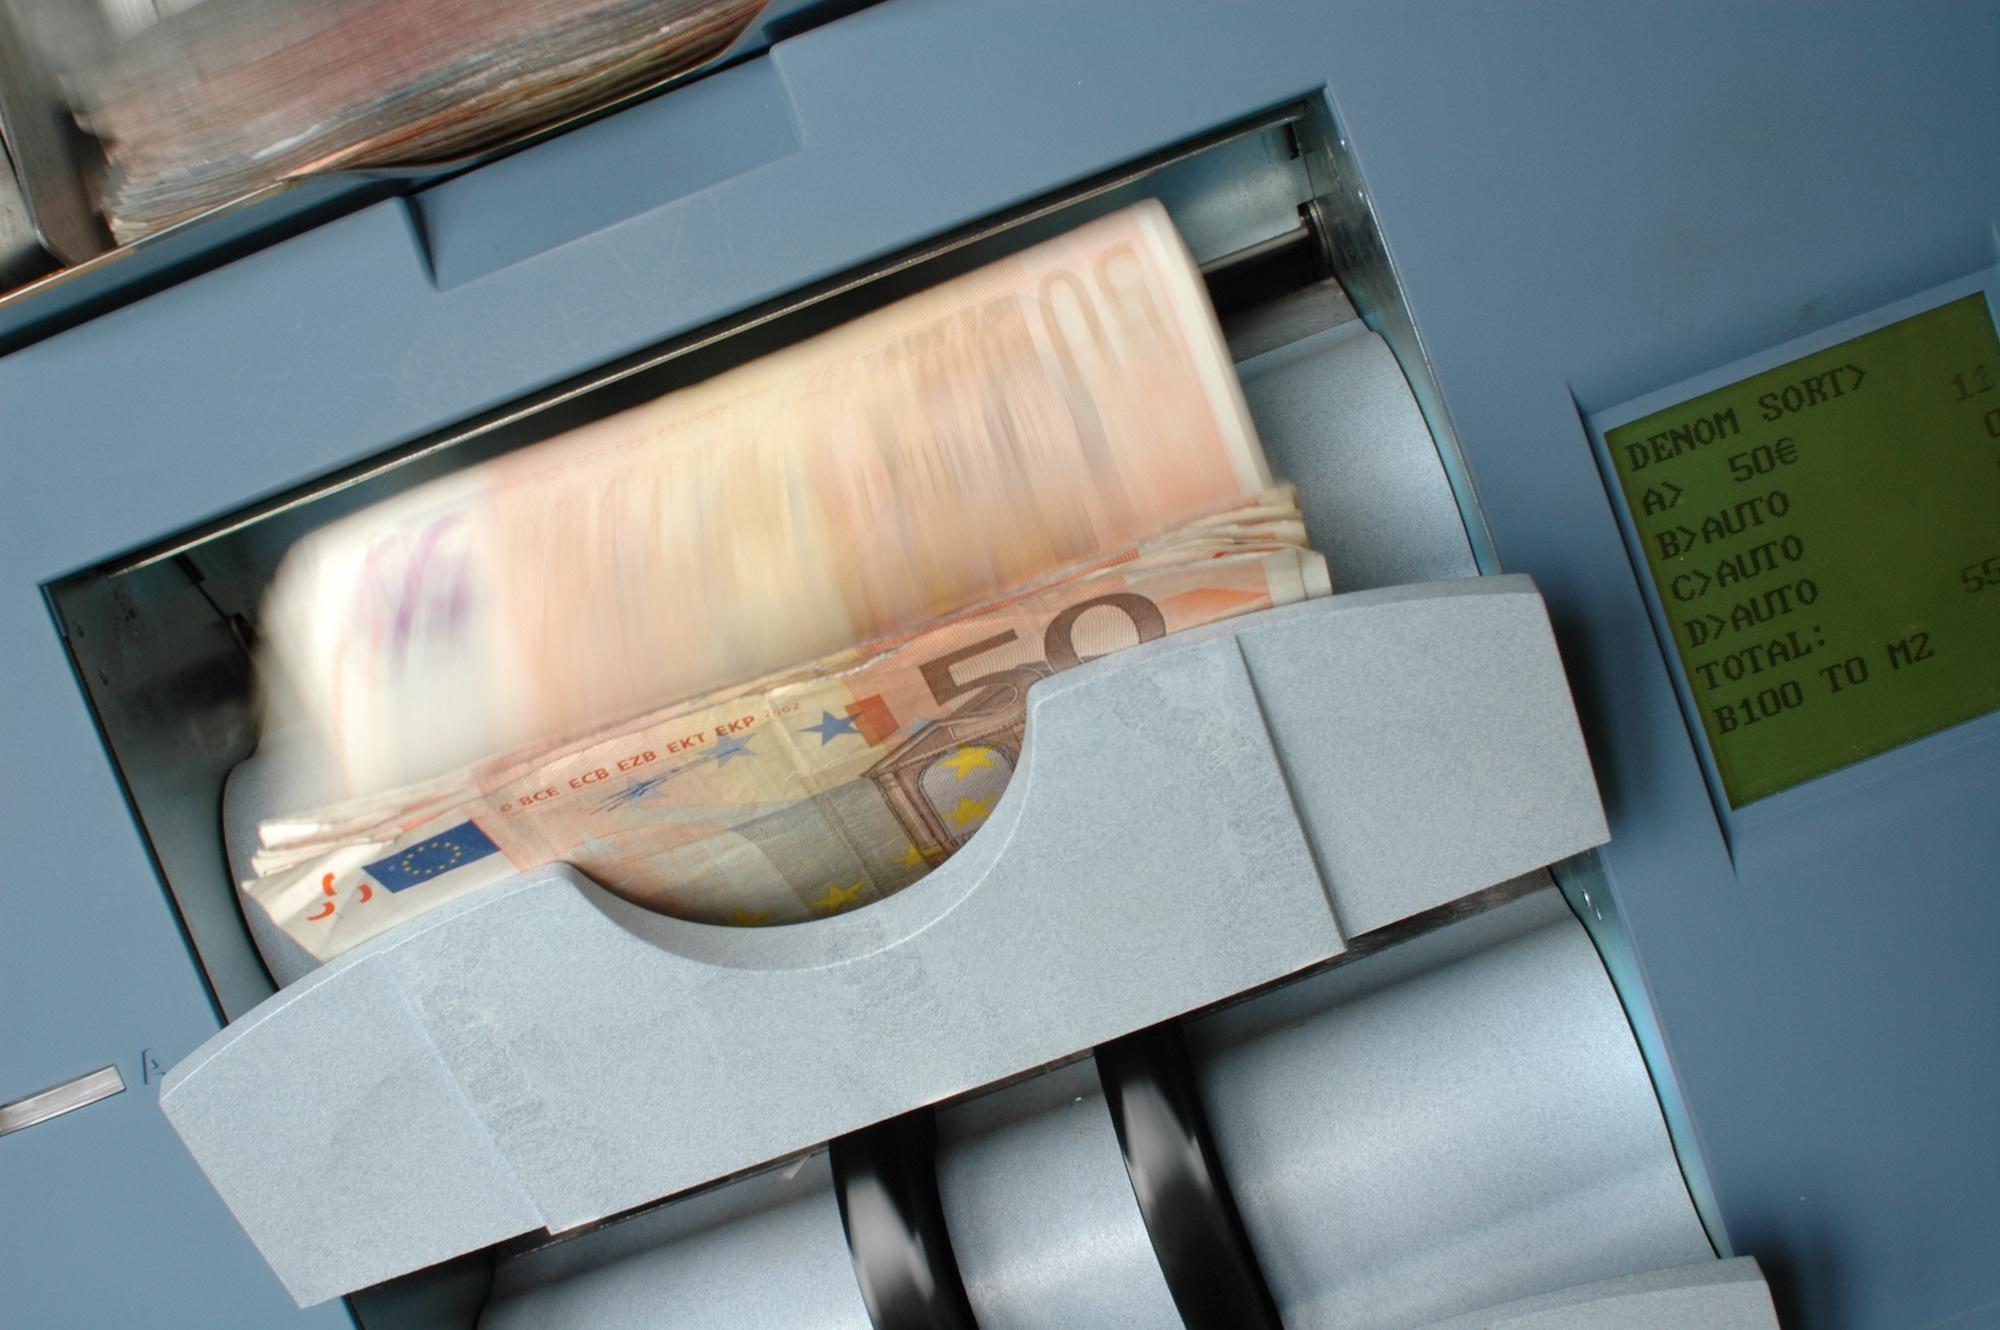 La banque postale lancera sa banque en ligne dès 2019